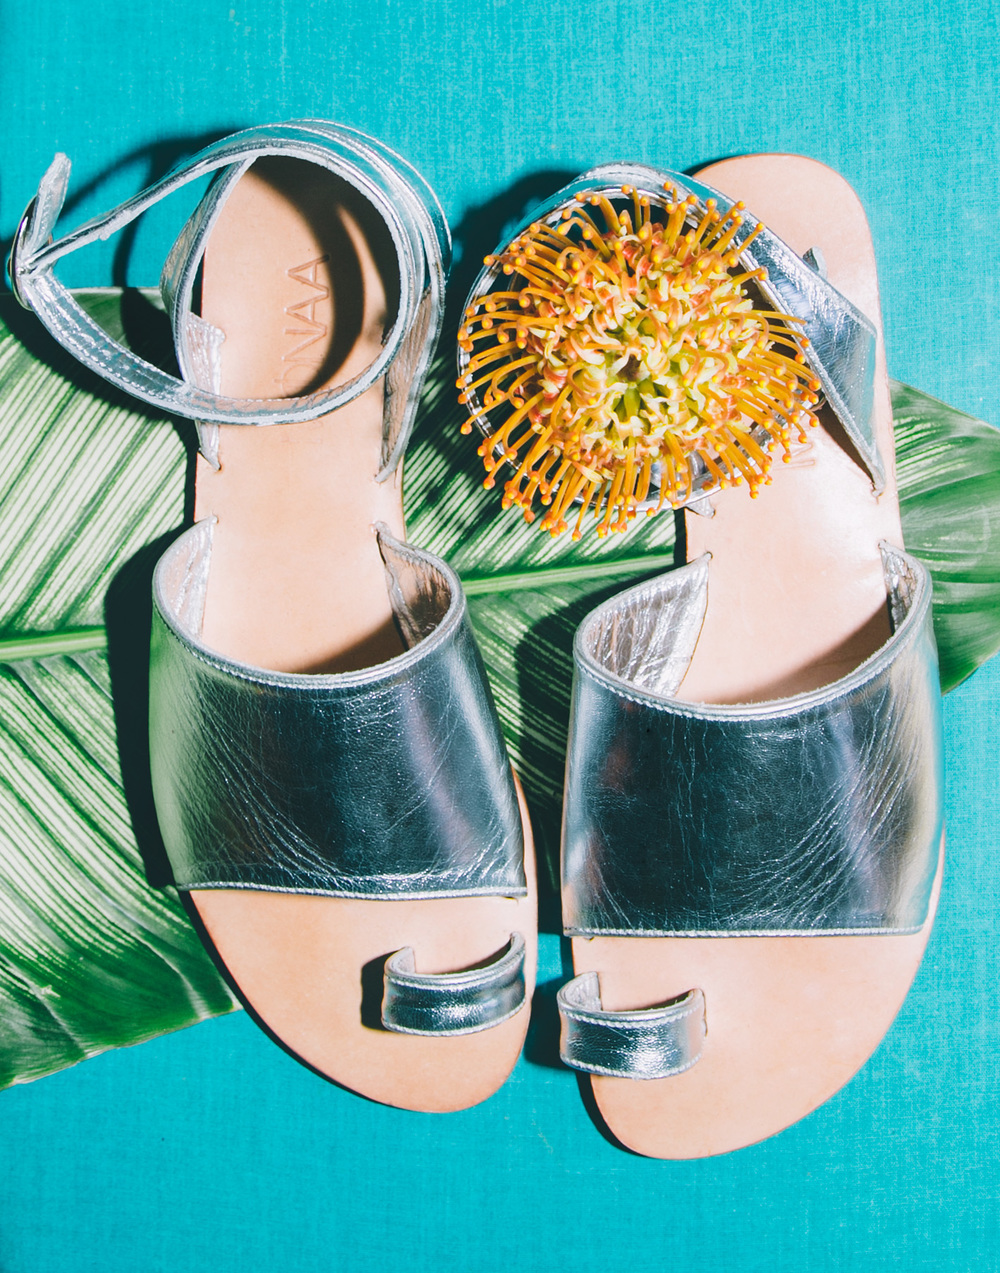 shoes-201.jpg